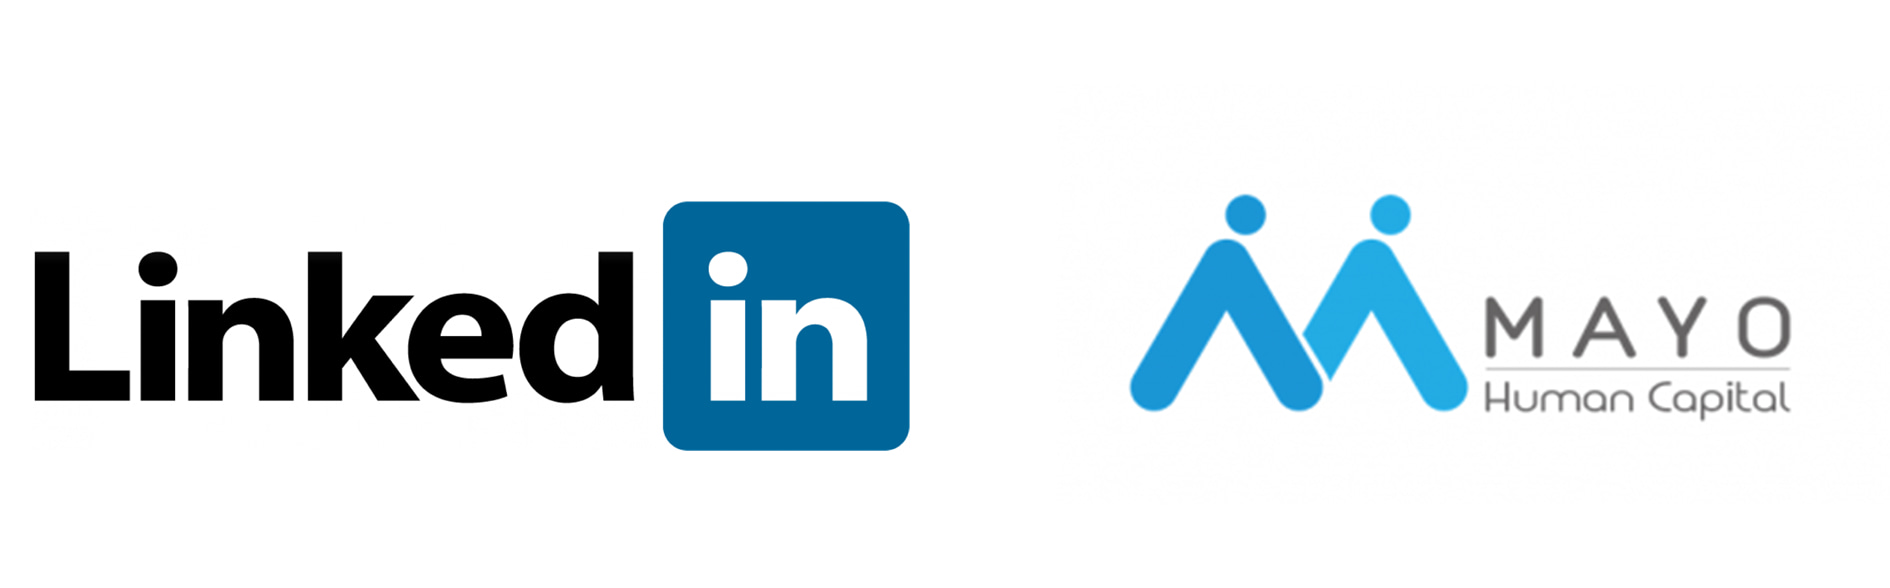 MAYO 是 LinkedIn 在台灣的服務商